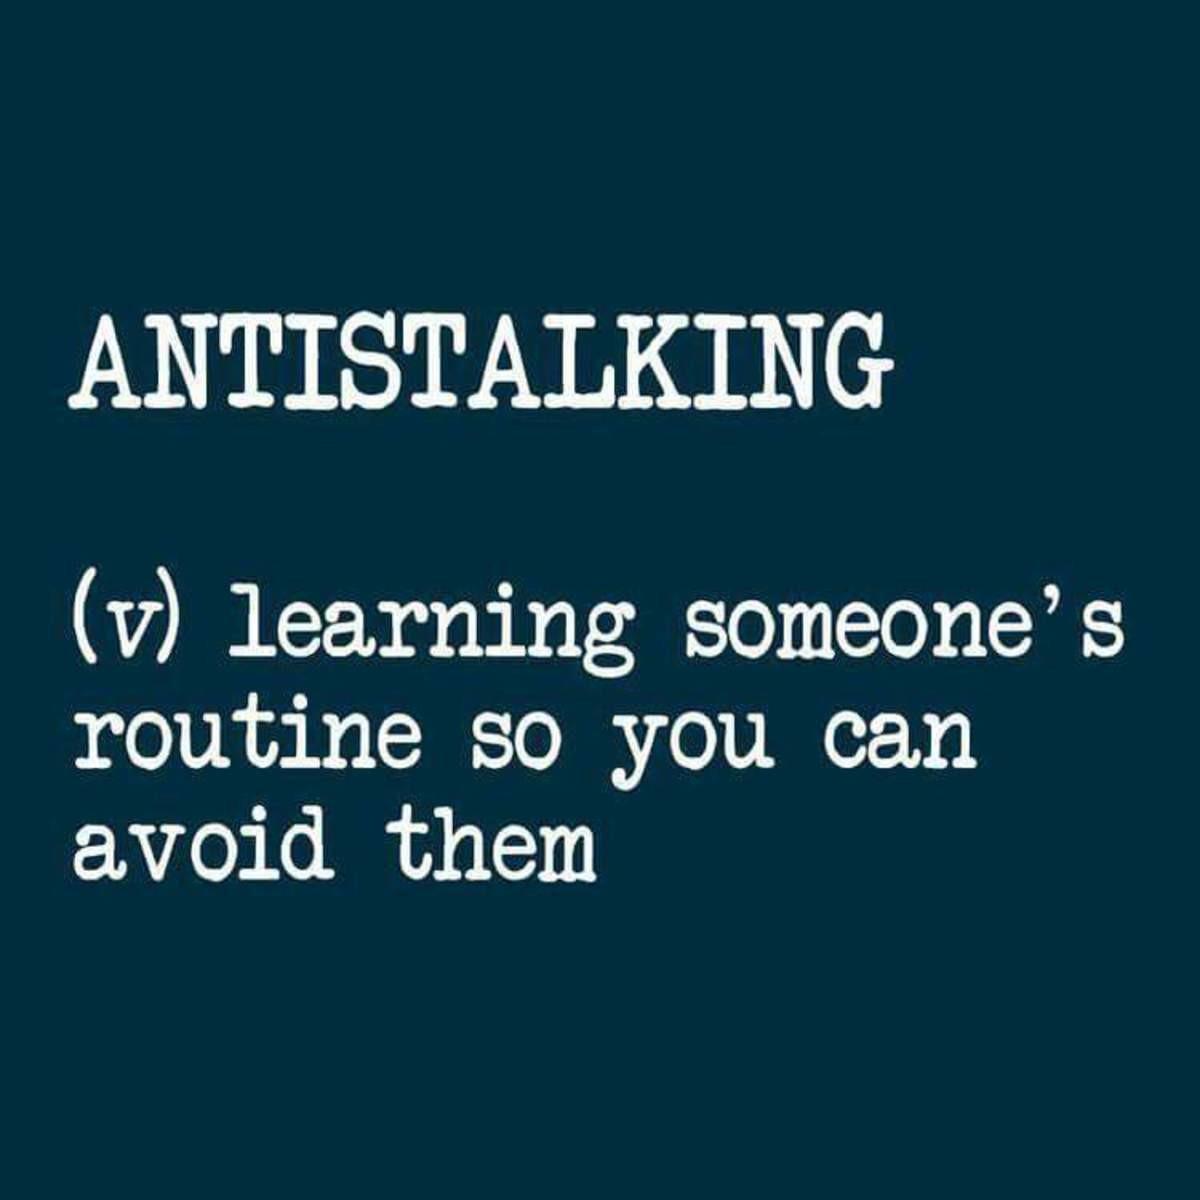 Antistalking. . Antistalking